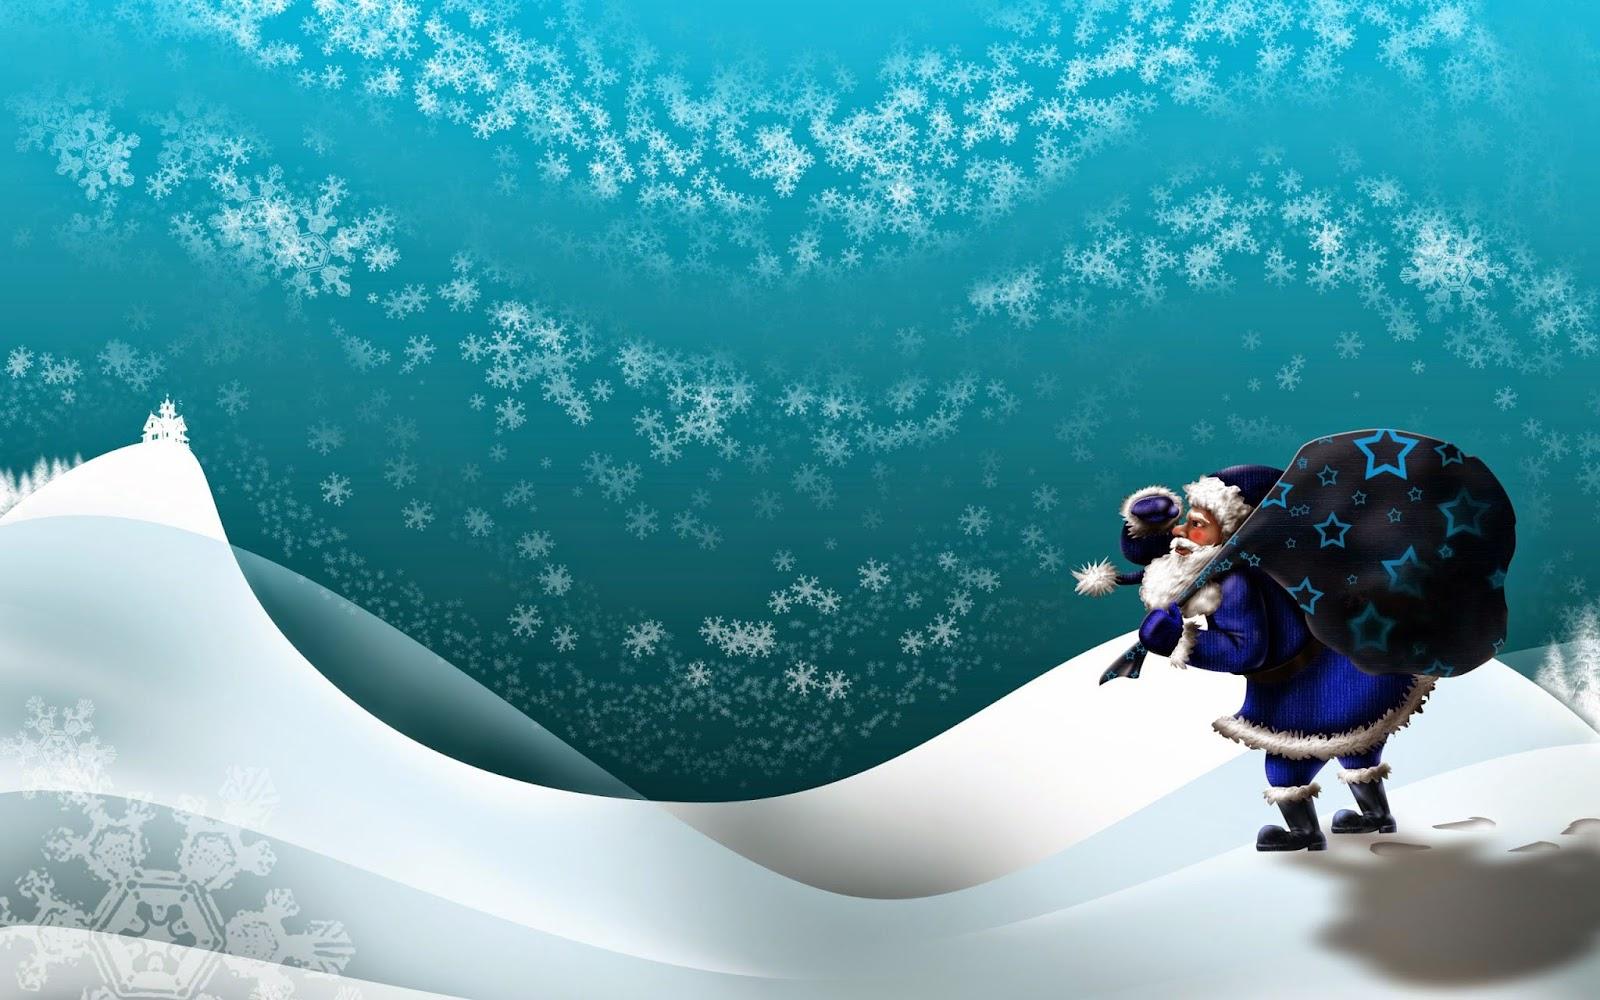 Santa-cartoon-funny-Christmas-pictures-for-facebook-whatsapp-sharing.jpg